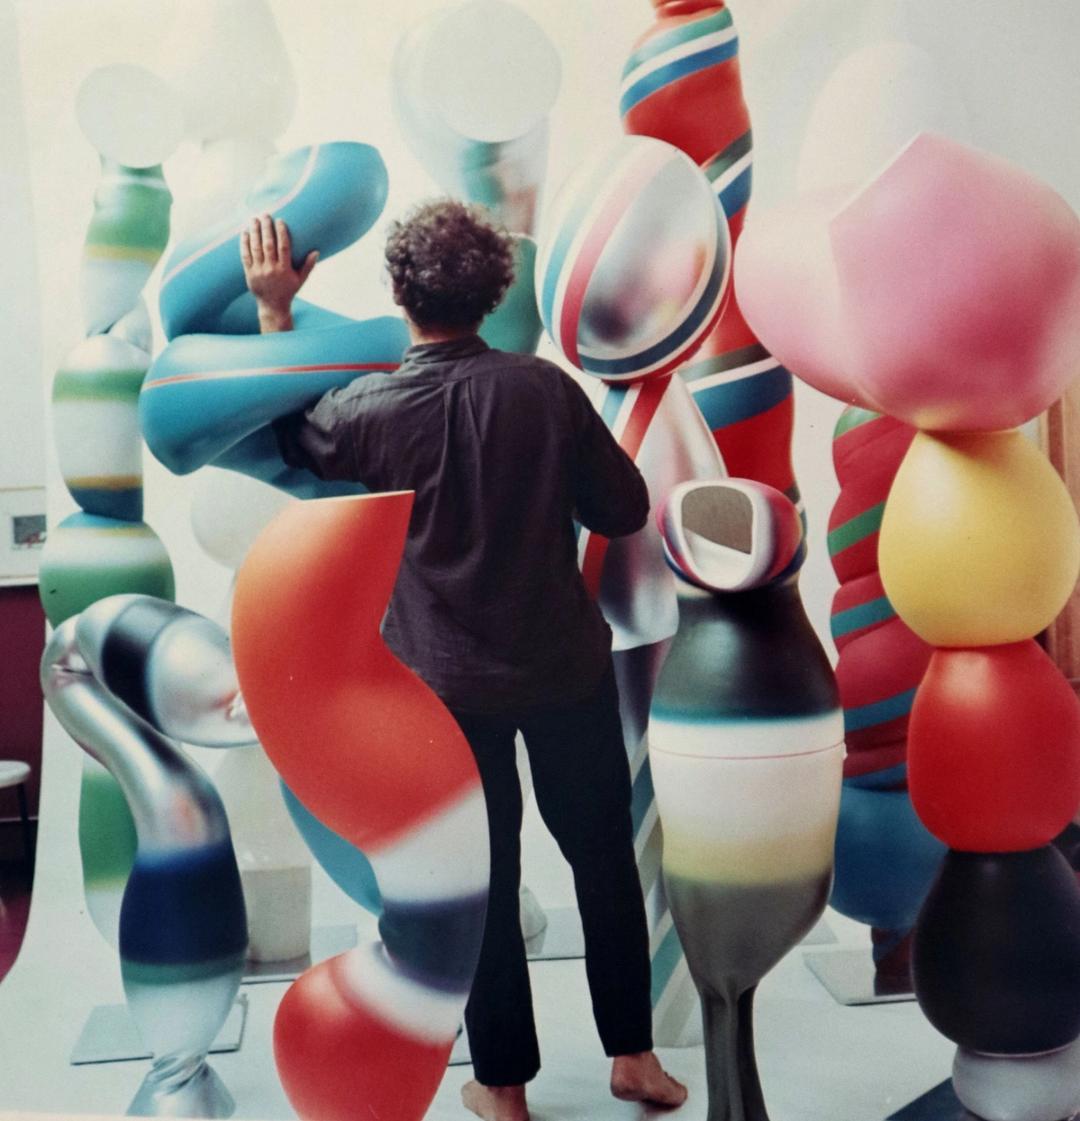 Stafan Knapp with Organic sculptures, 1965